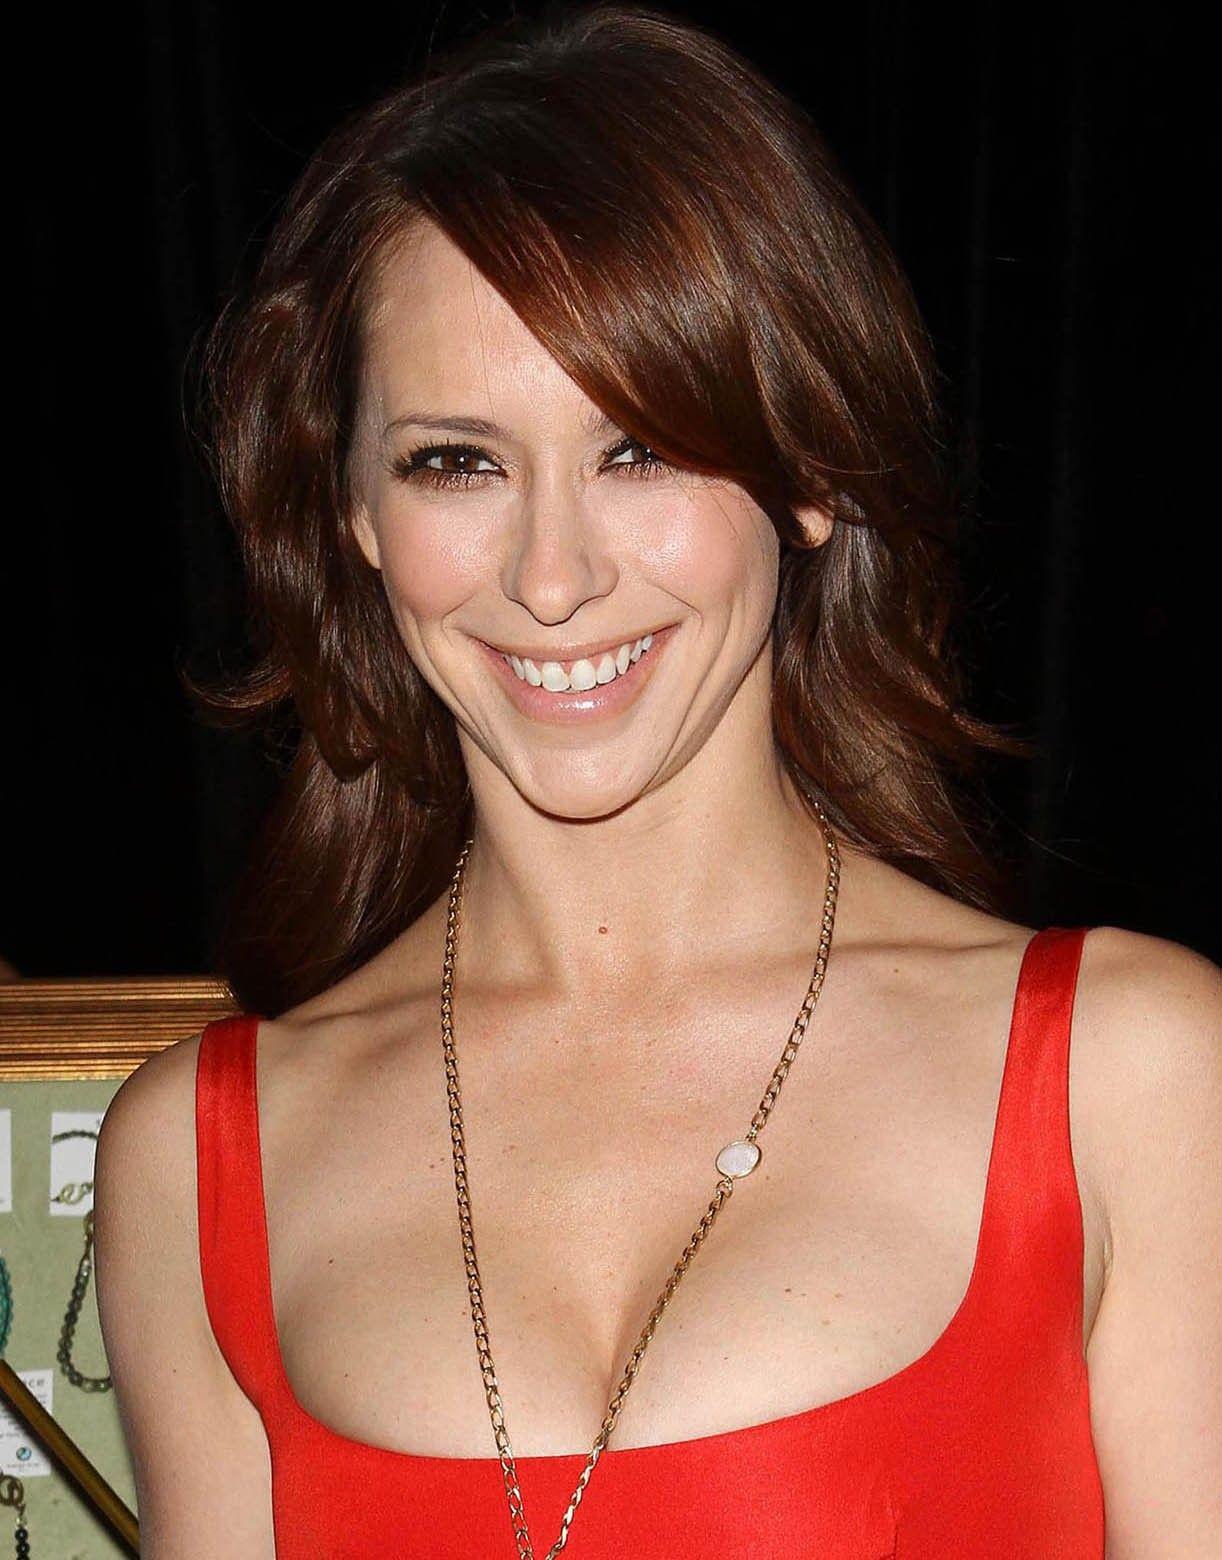 Jennifer aime le sexe hewitt scens